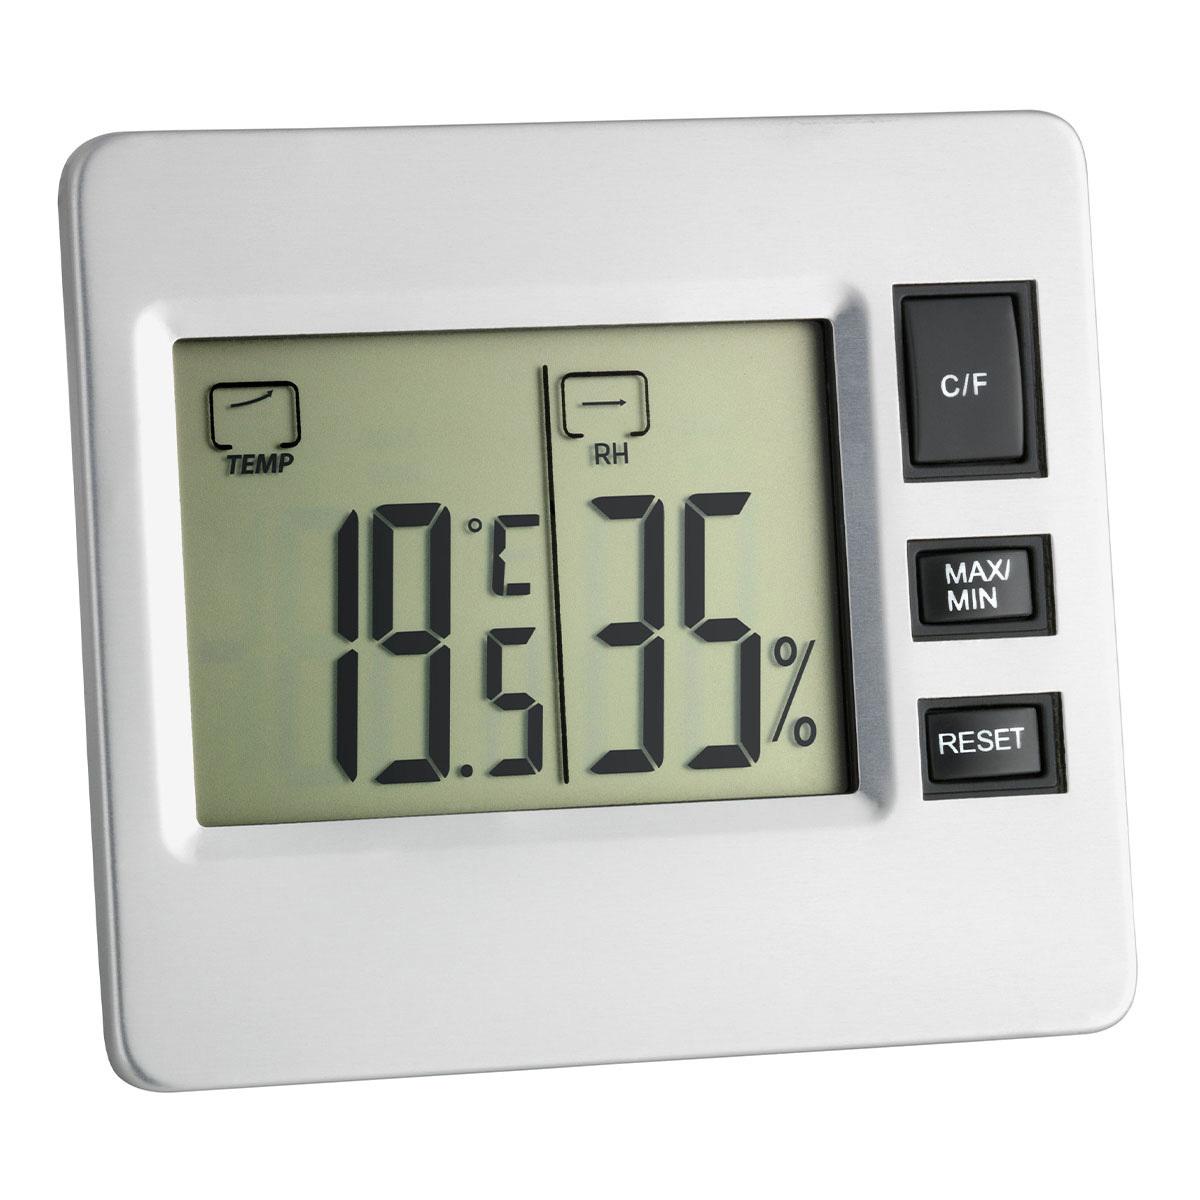 30-5028-digitales-thermo-hygrometer-1200x1200px.jpg